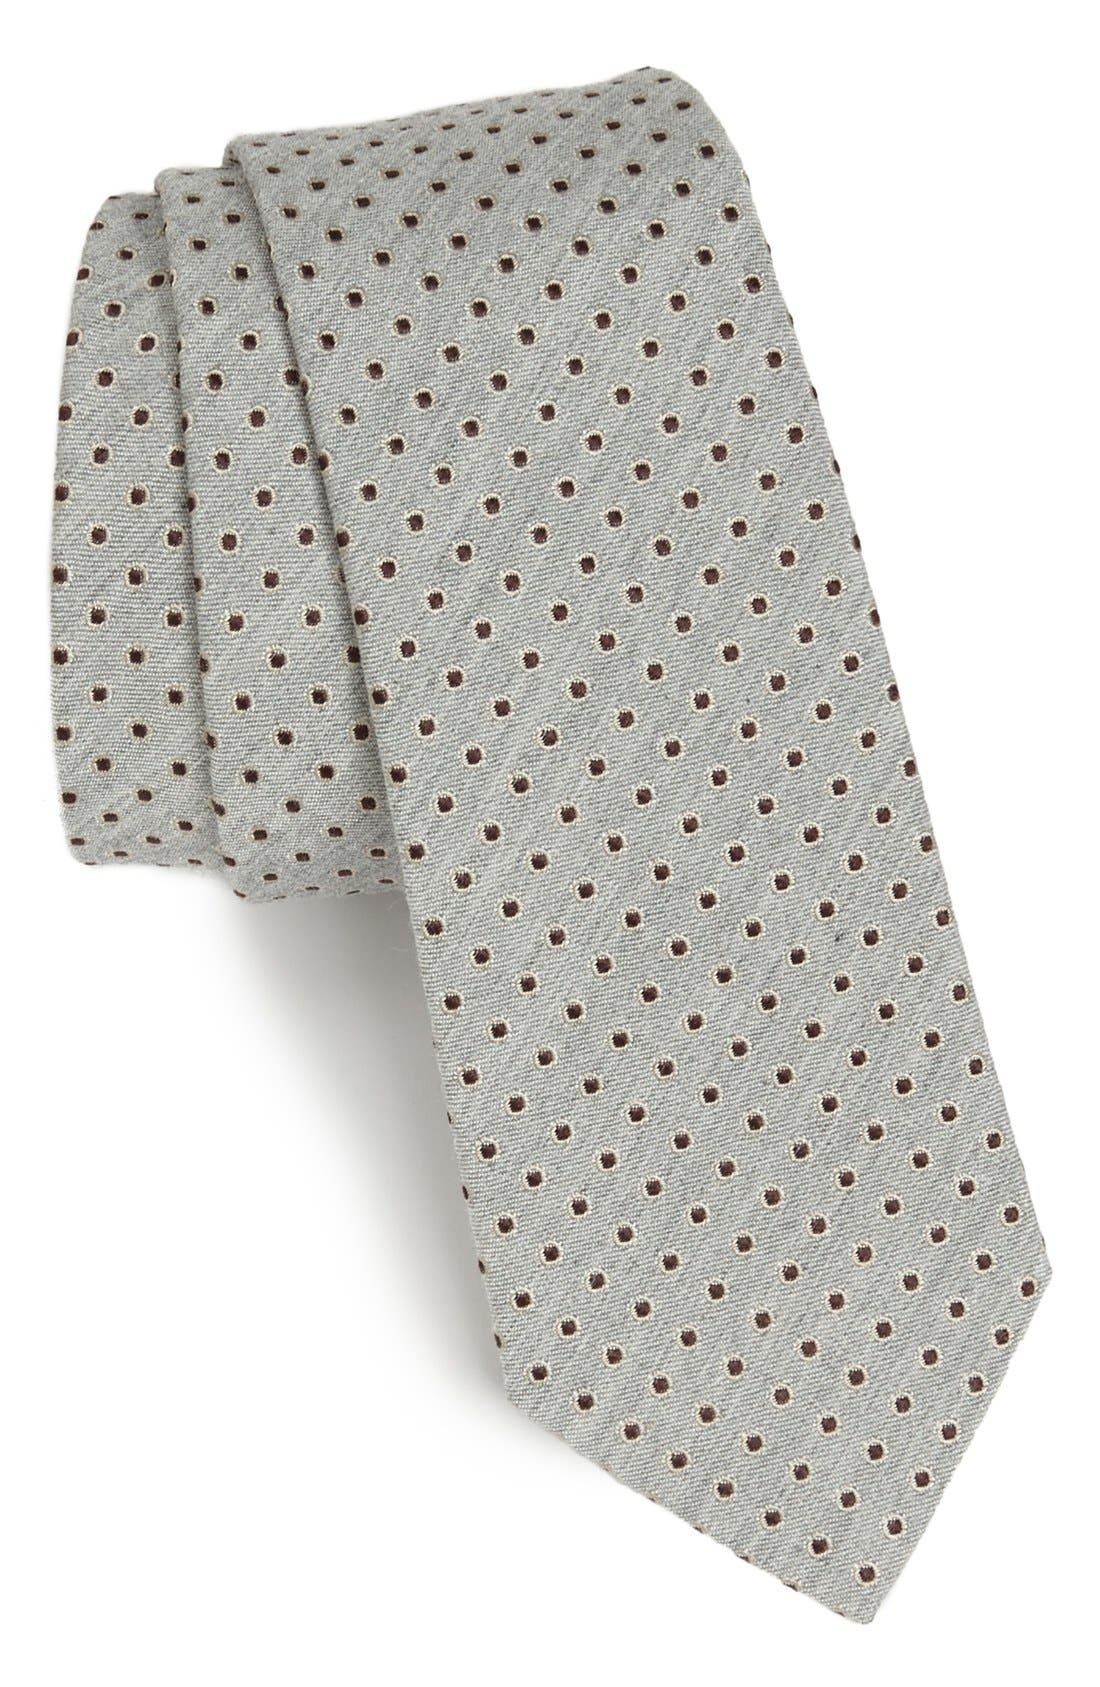 Alternate Image 1 Selected - Dolce&Gabbana Martini Weave Circle Dot Silk Tie